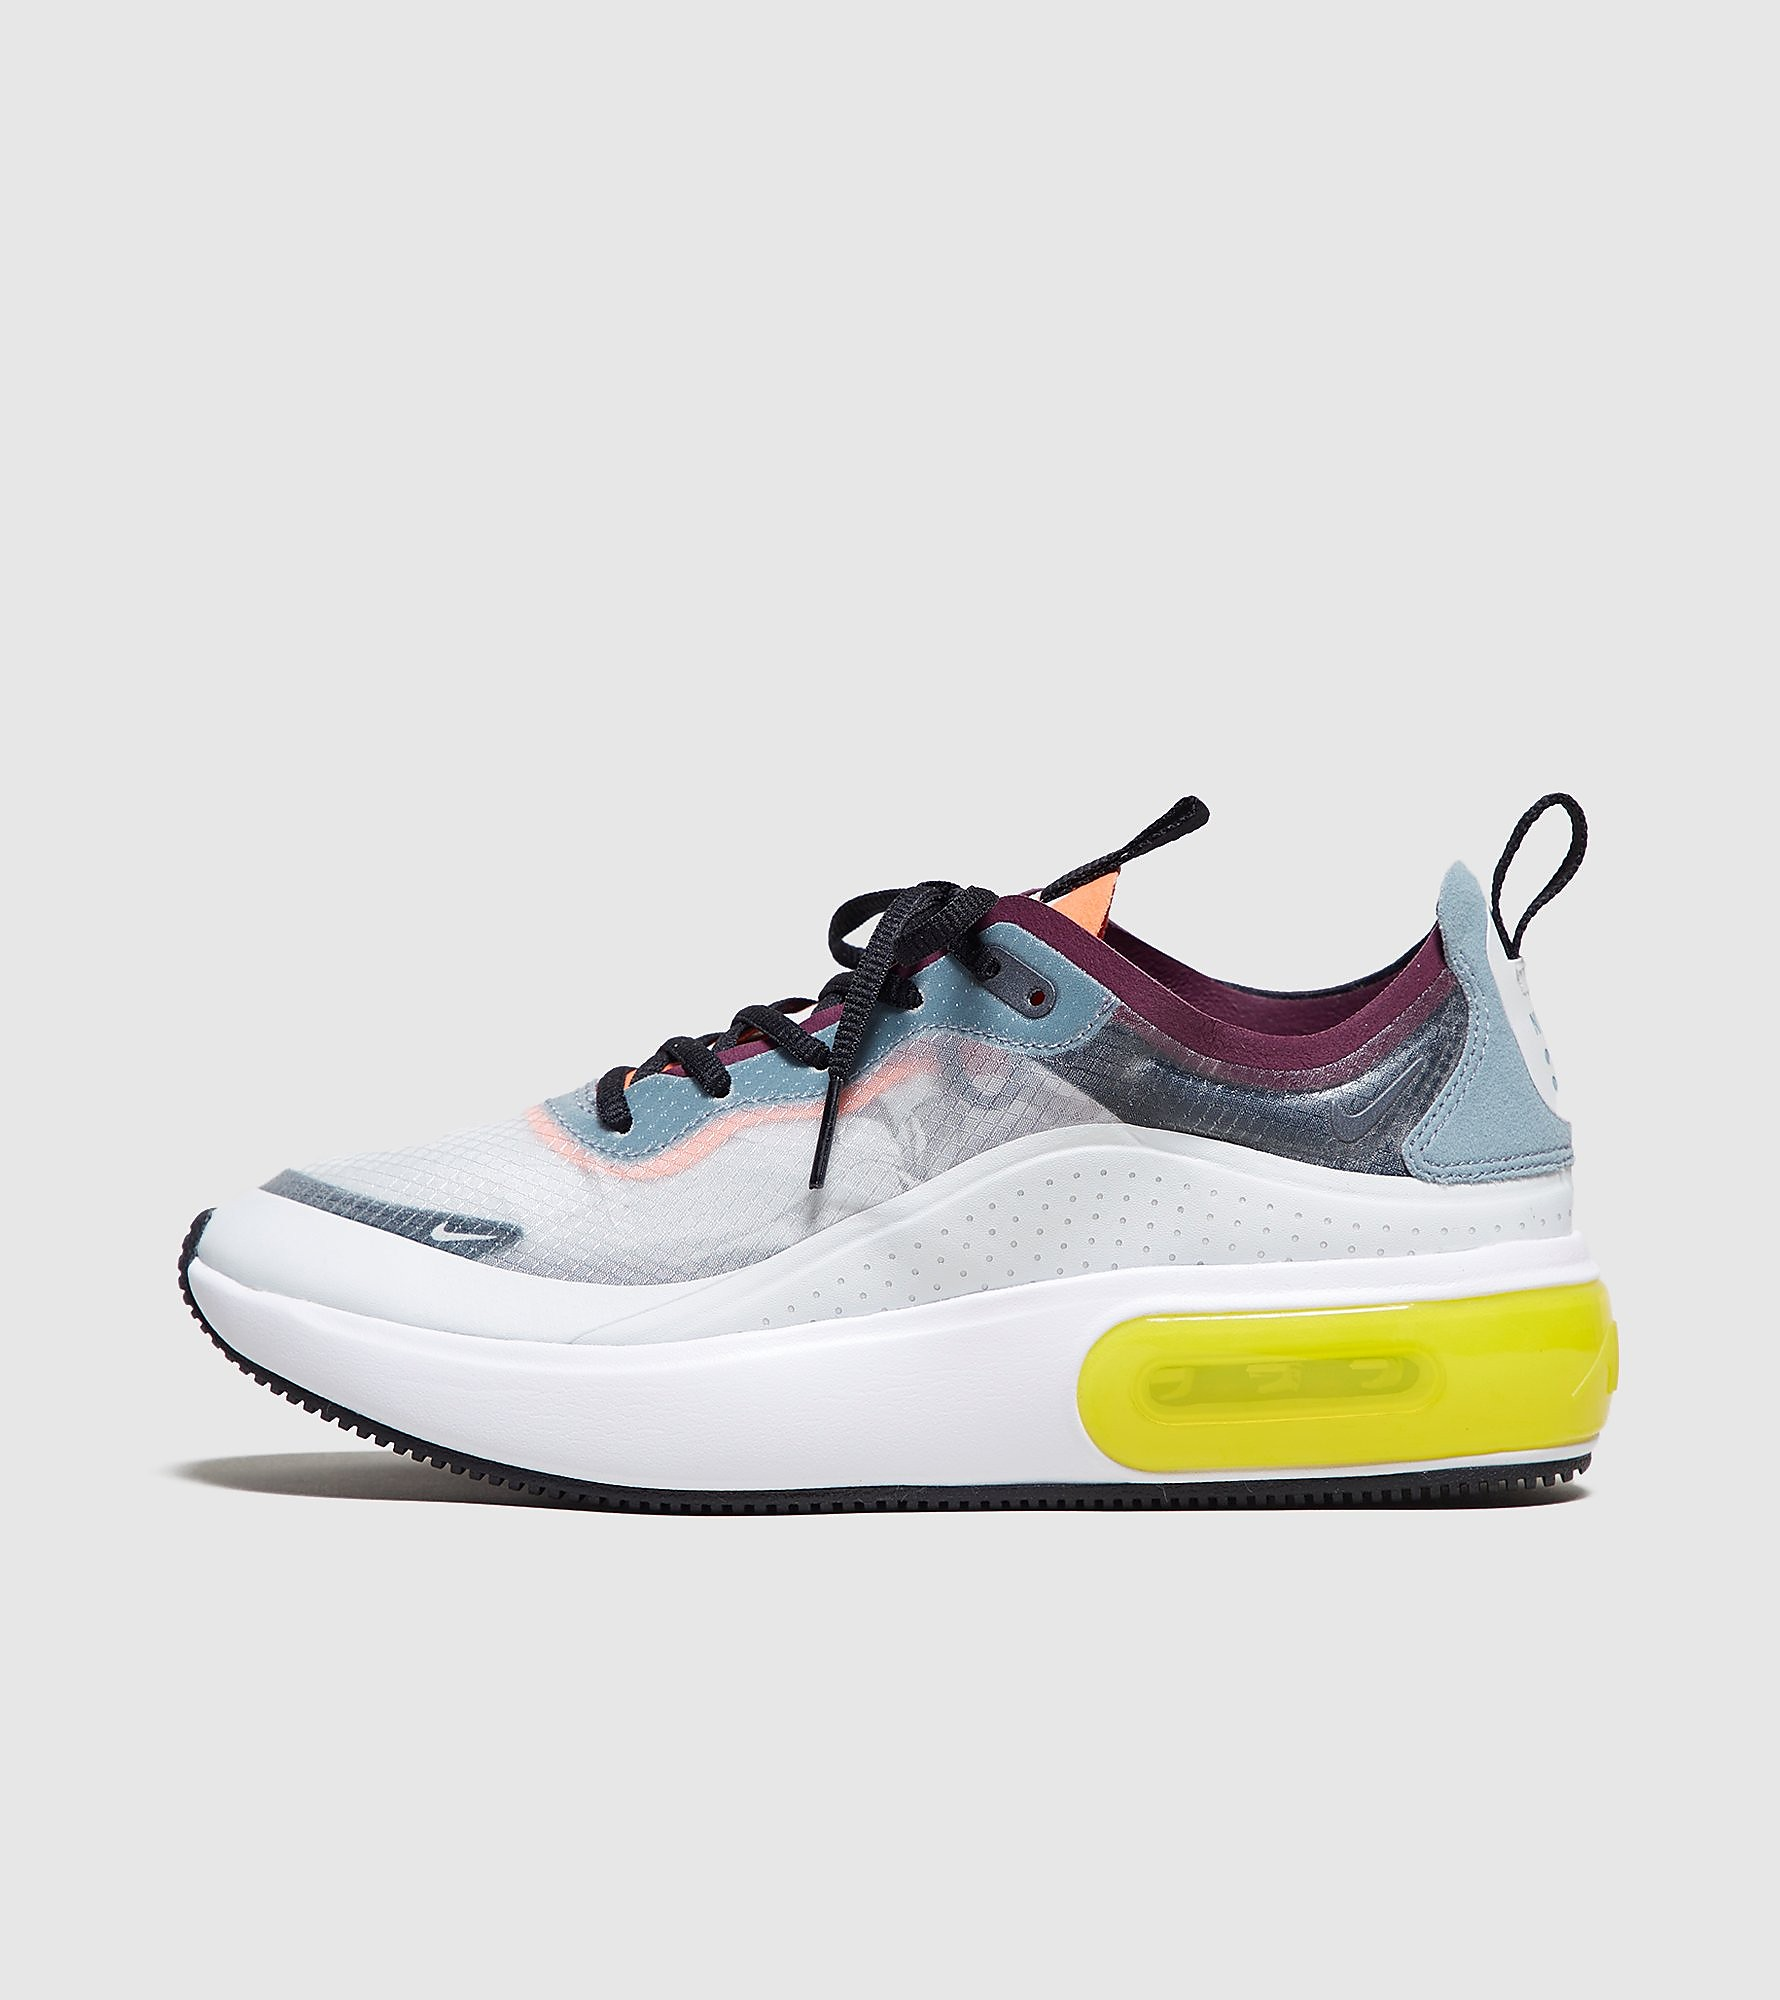 nike zapatillas mujer 2019